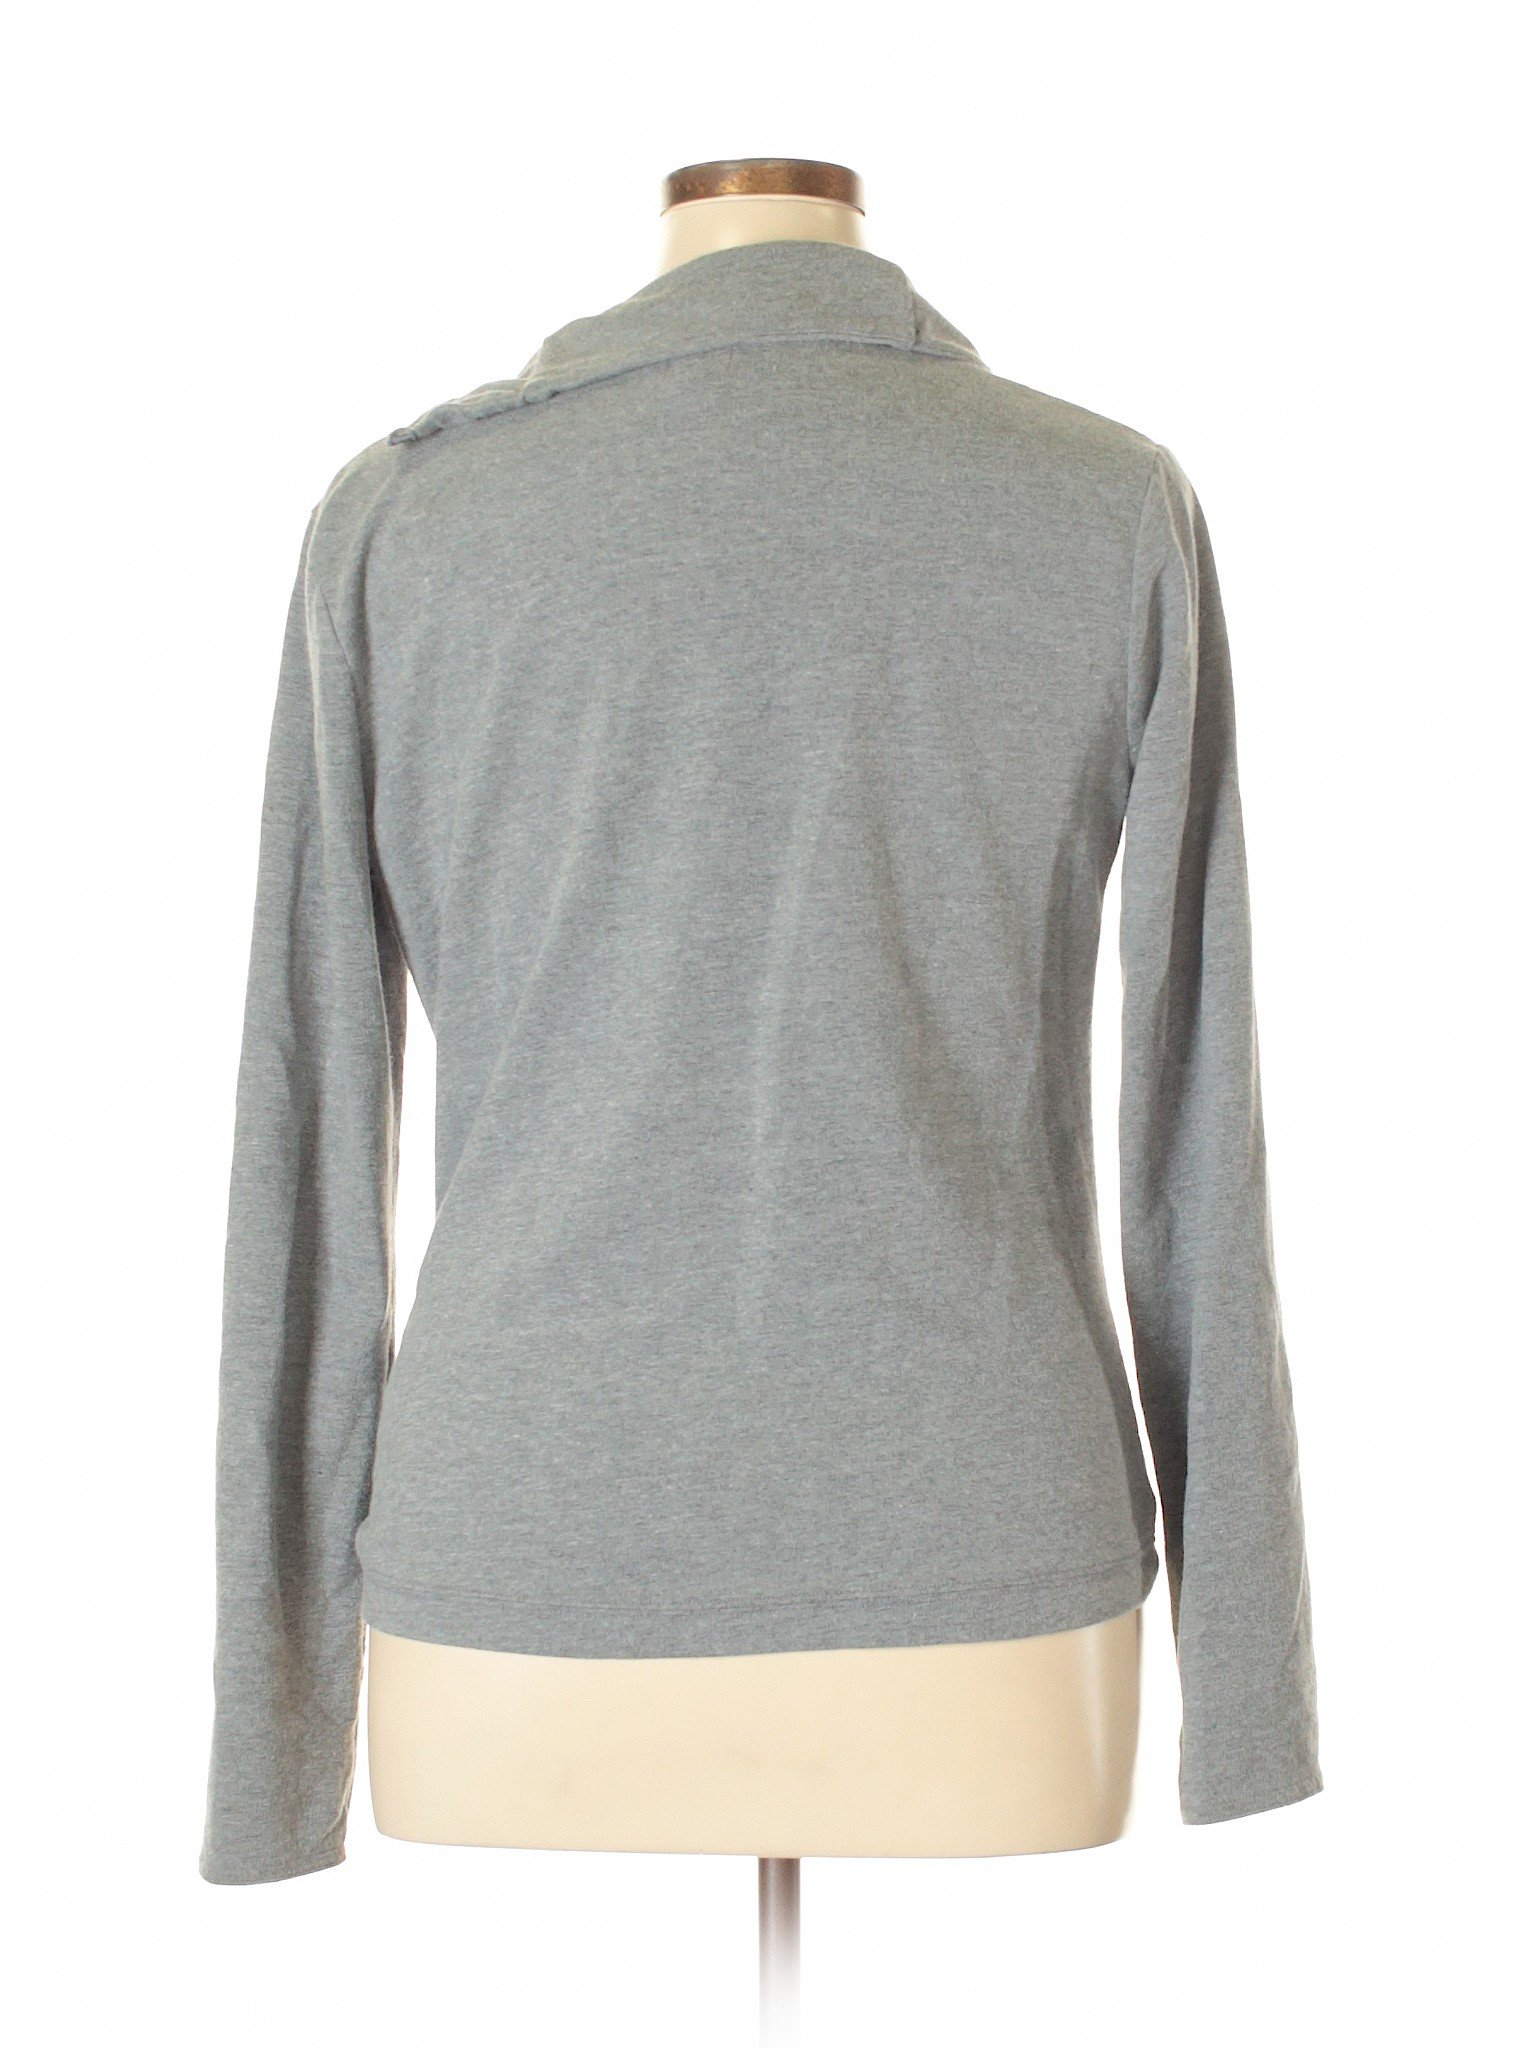 429d5f8ba4b4d8 Converse Jacket  Size 12.00 Gray Women s Jackets   Outerwear -  18.99